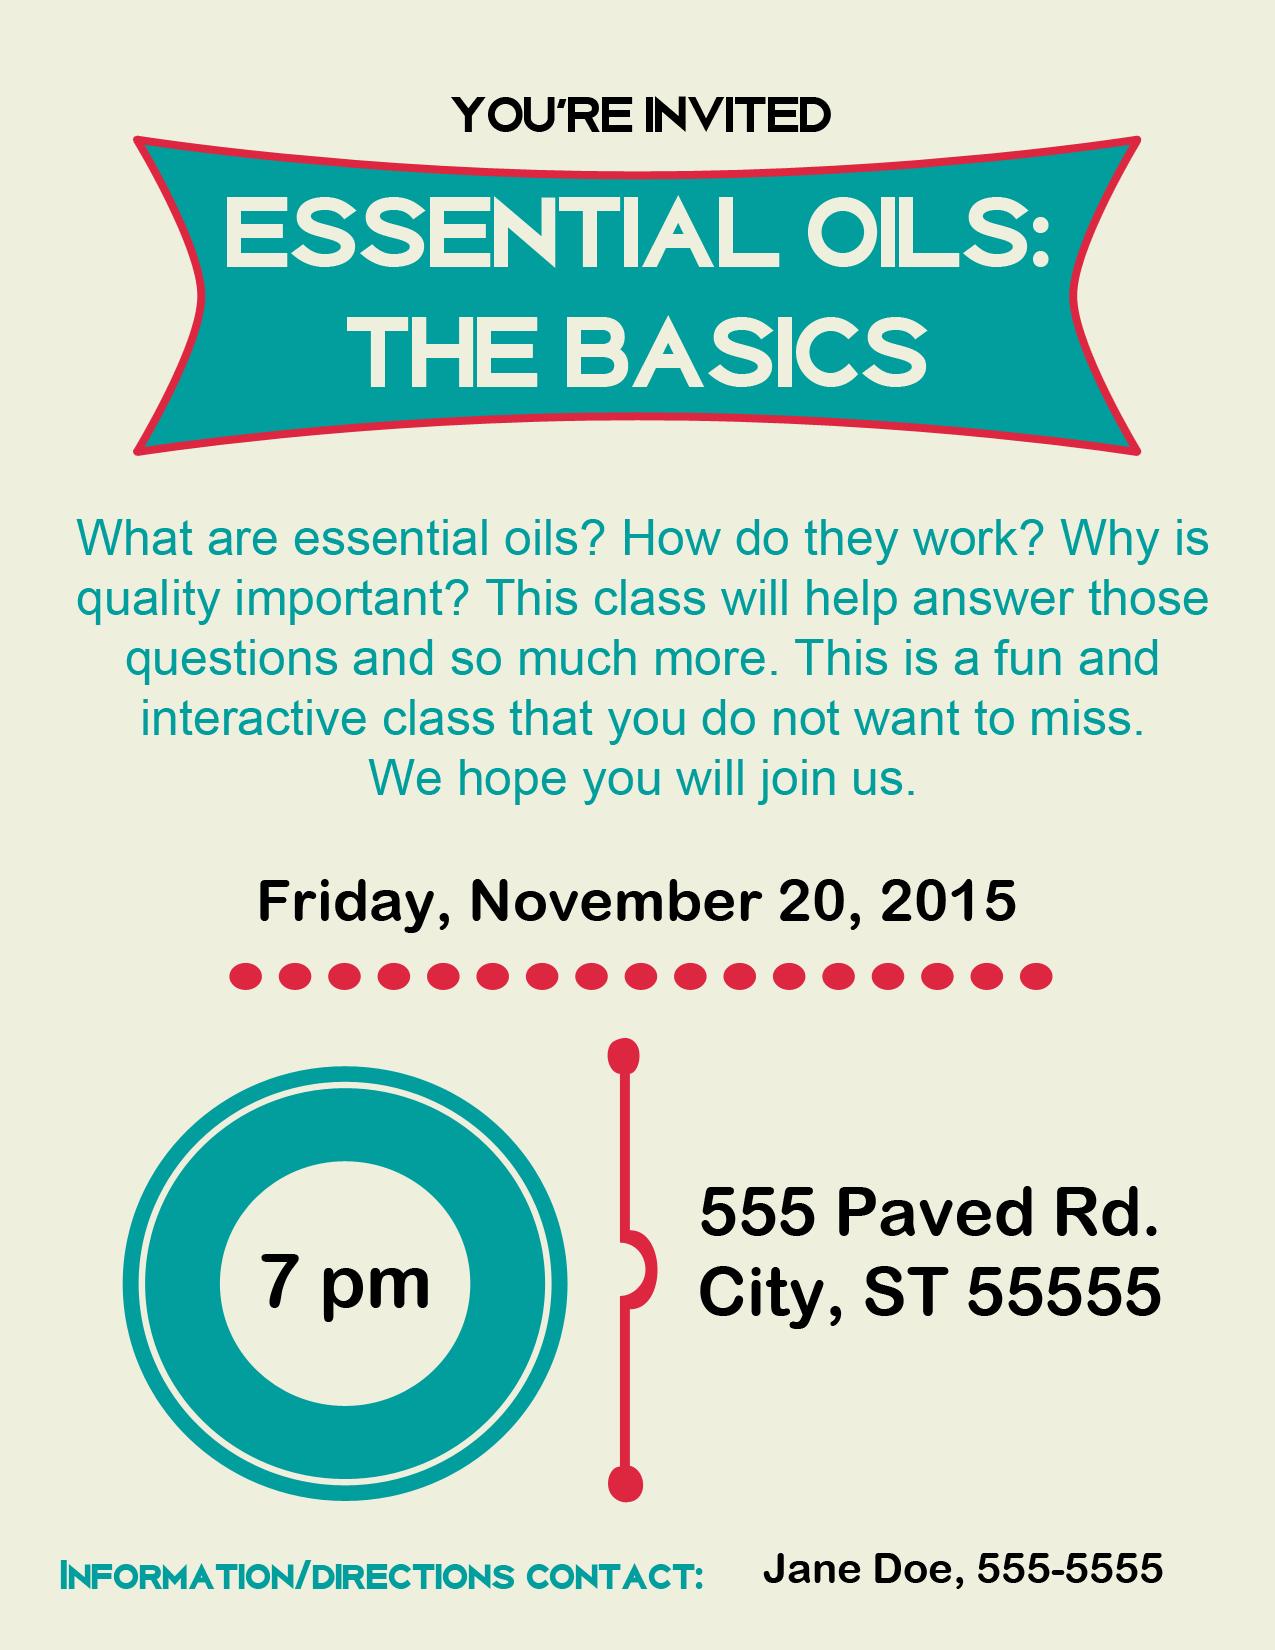 Invitations | The Oil Posse